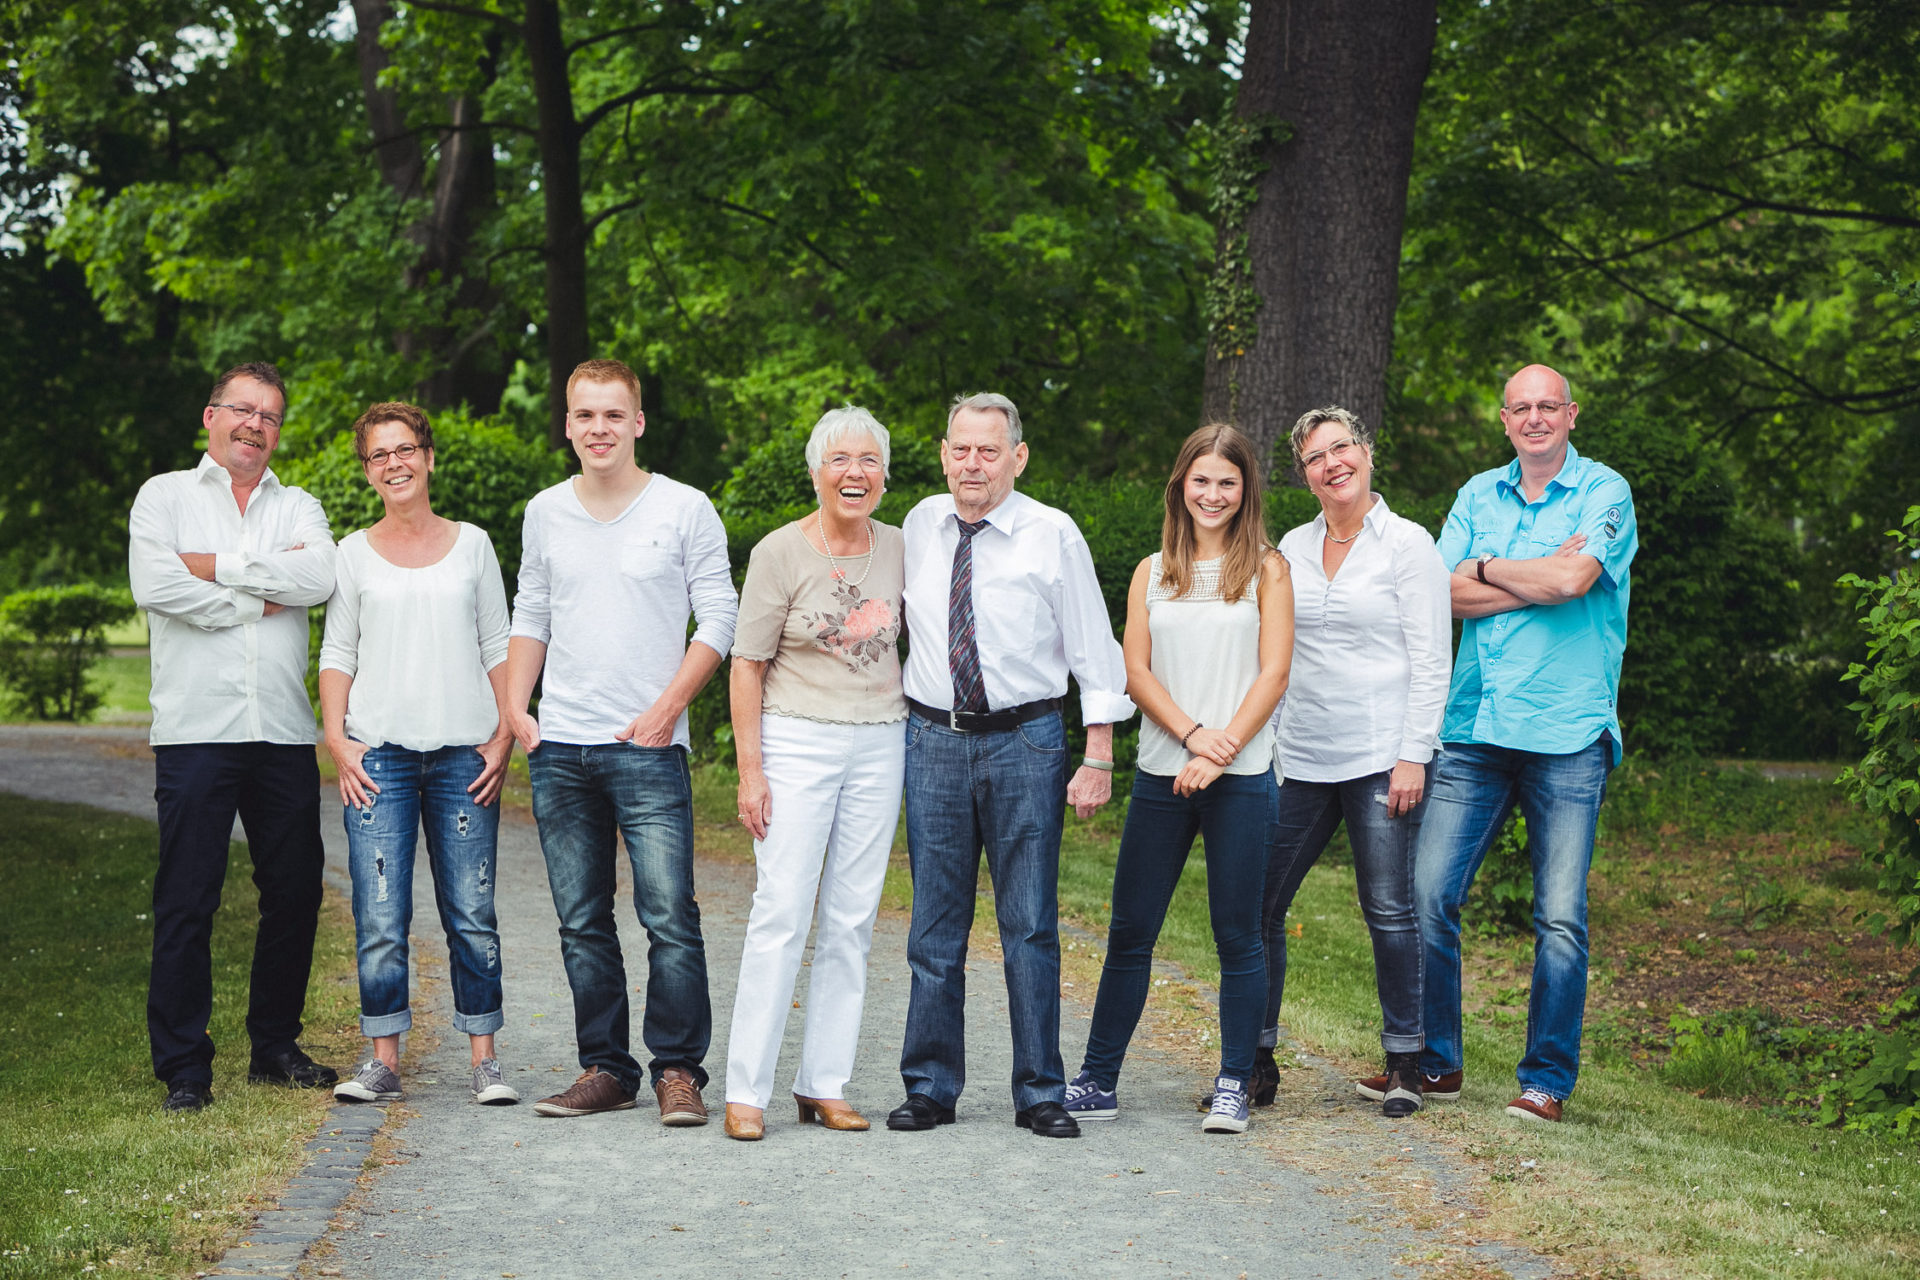 Familienshooting-2279